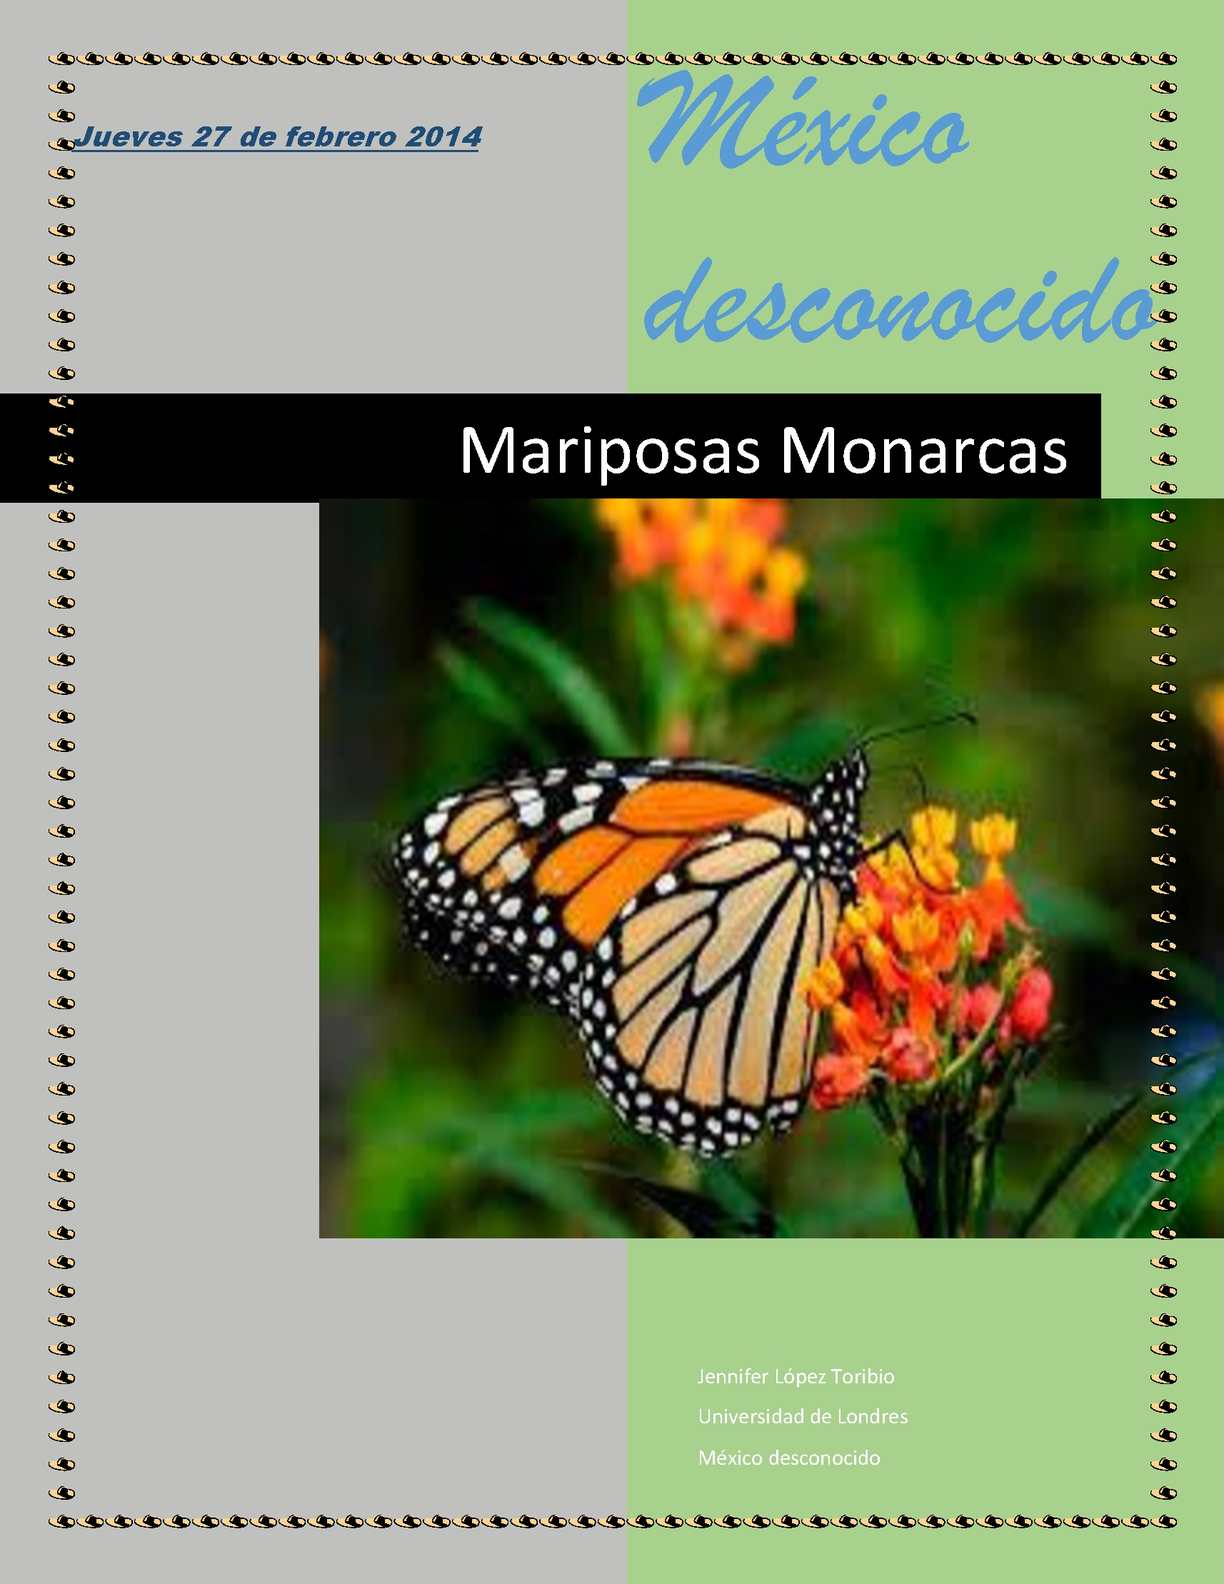 Calaméo - Mariposas Monarcas1pdf